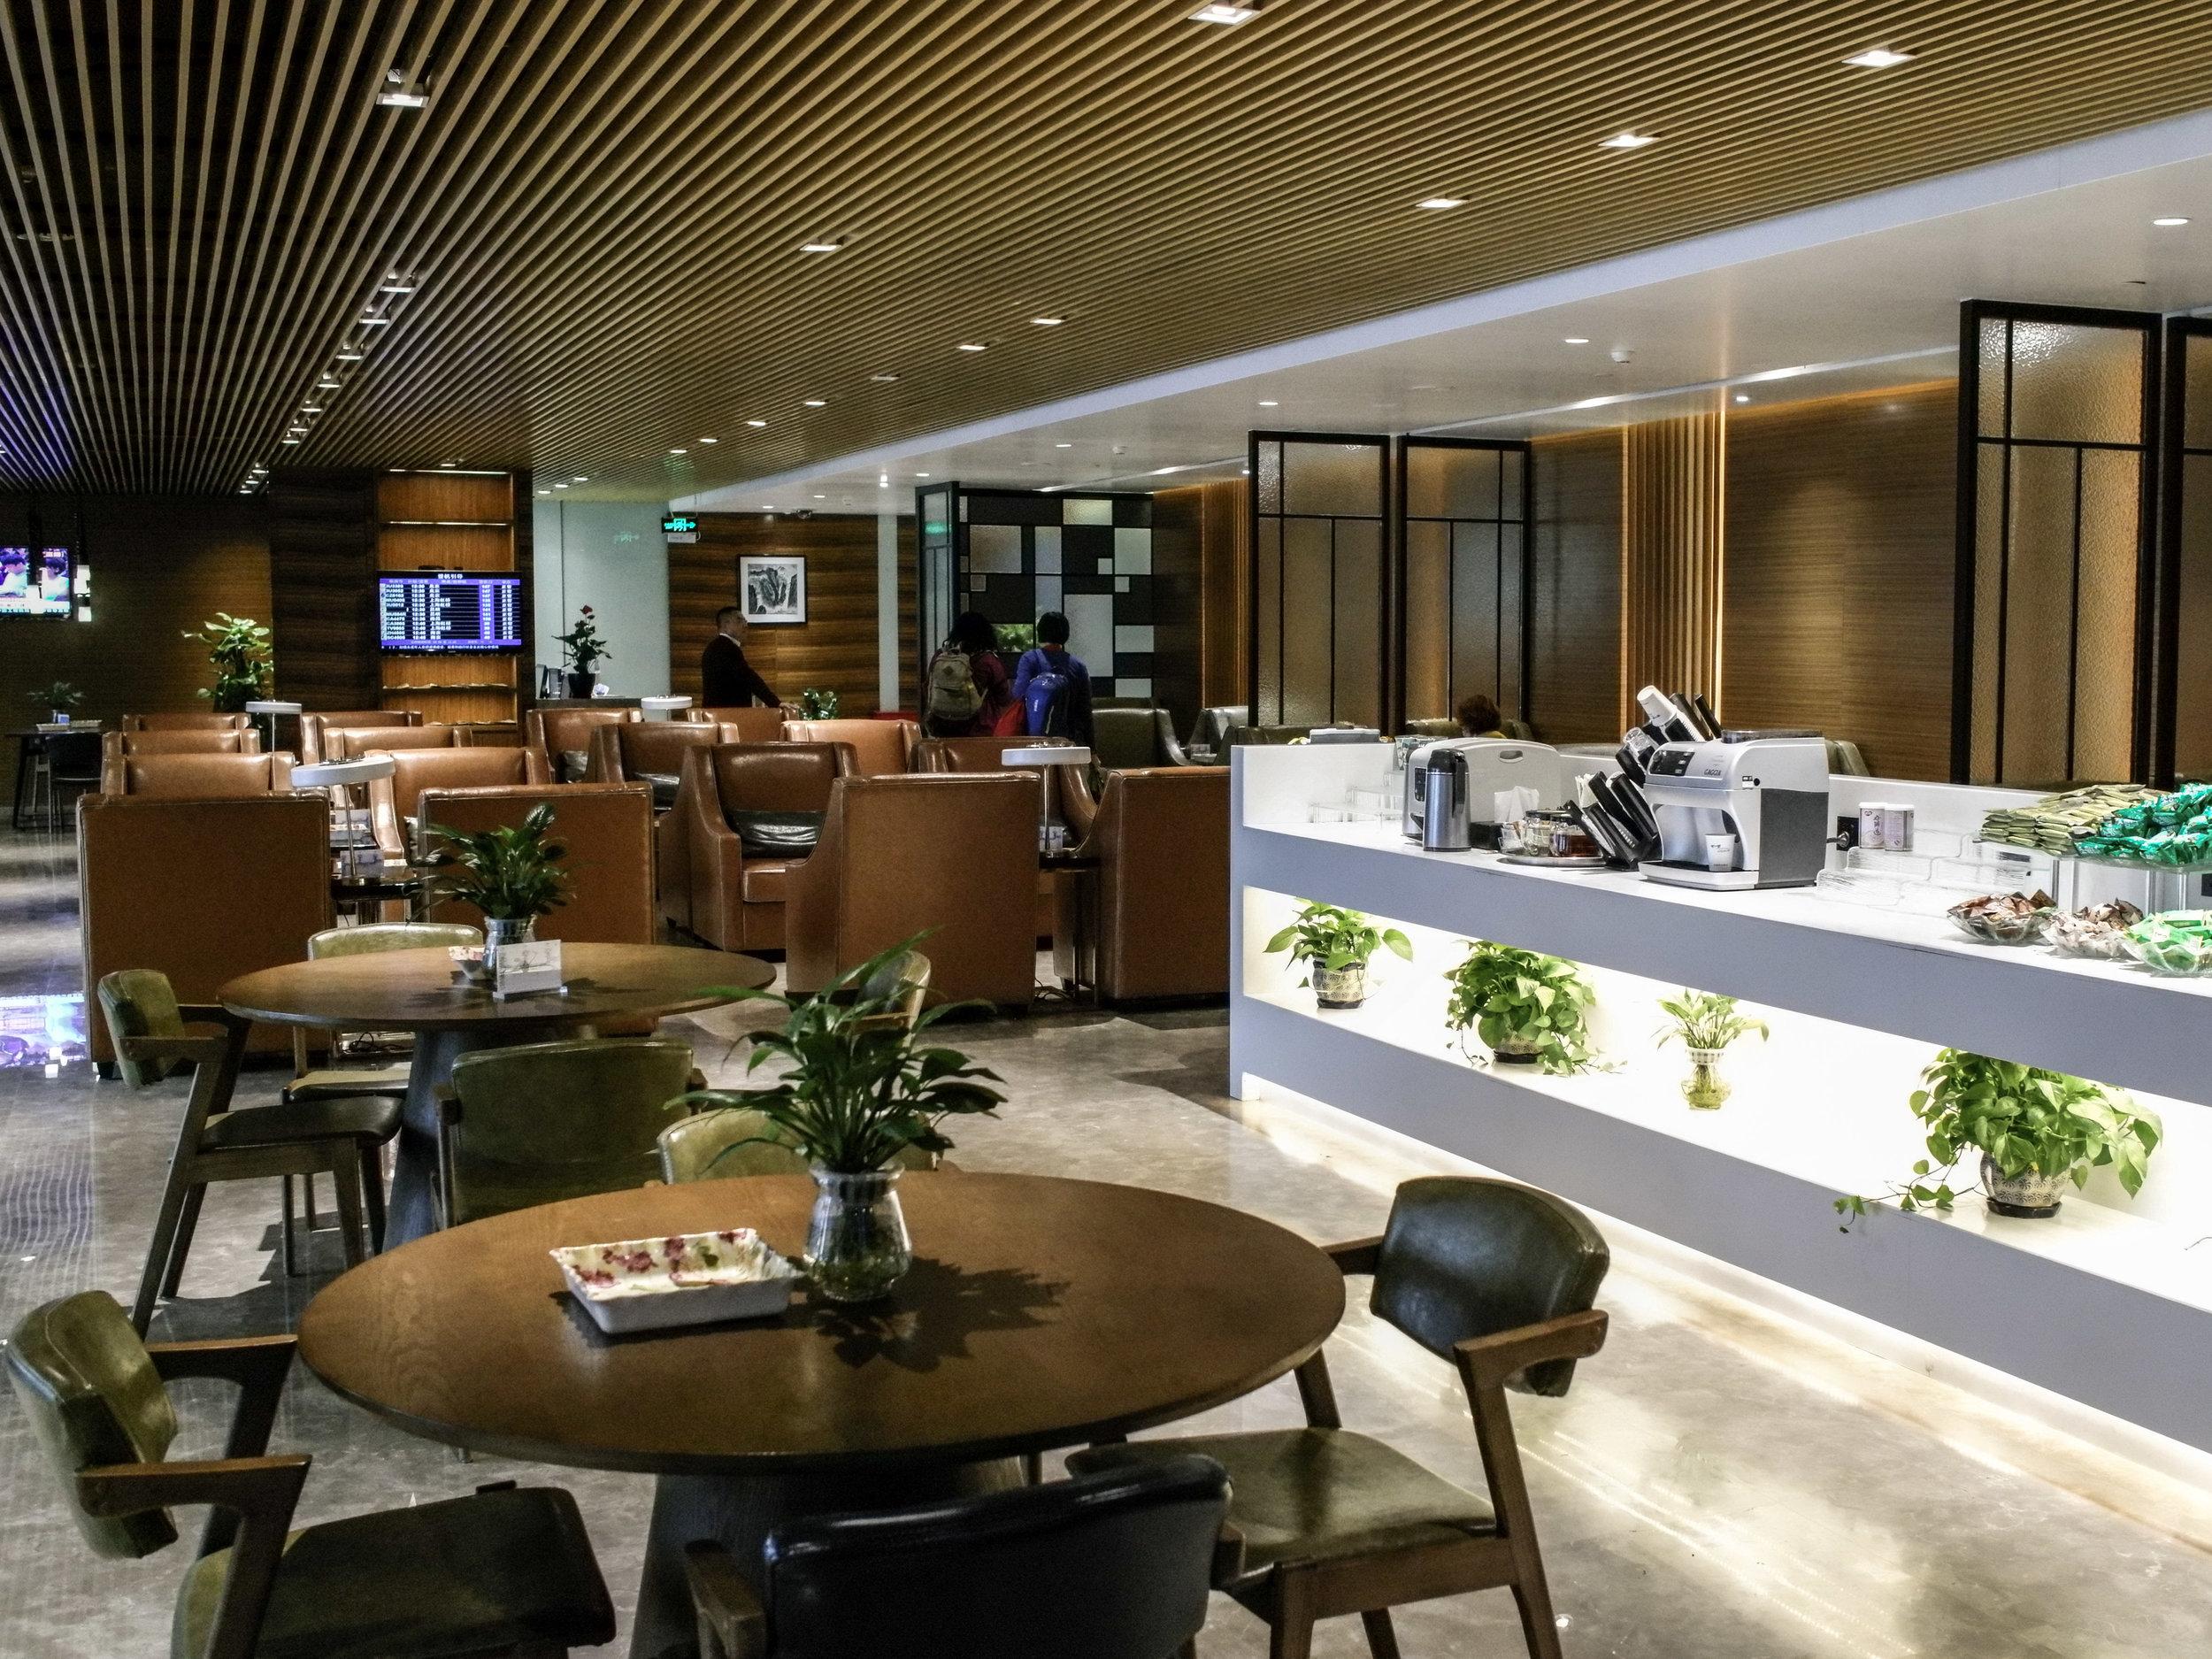 Chengdu airport terminal 1 - First Class Lounge